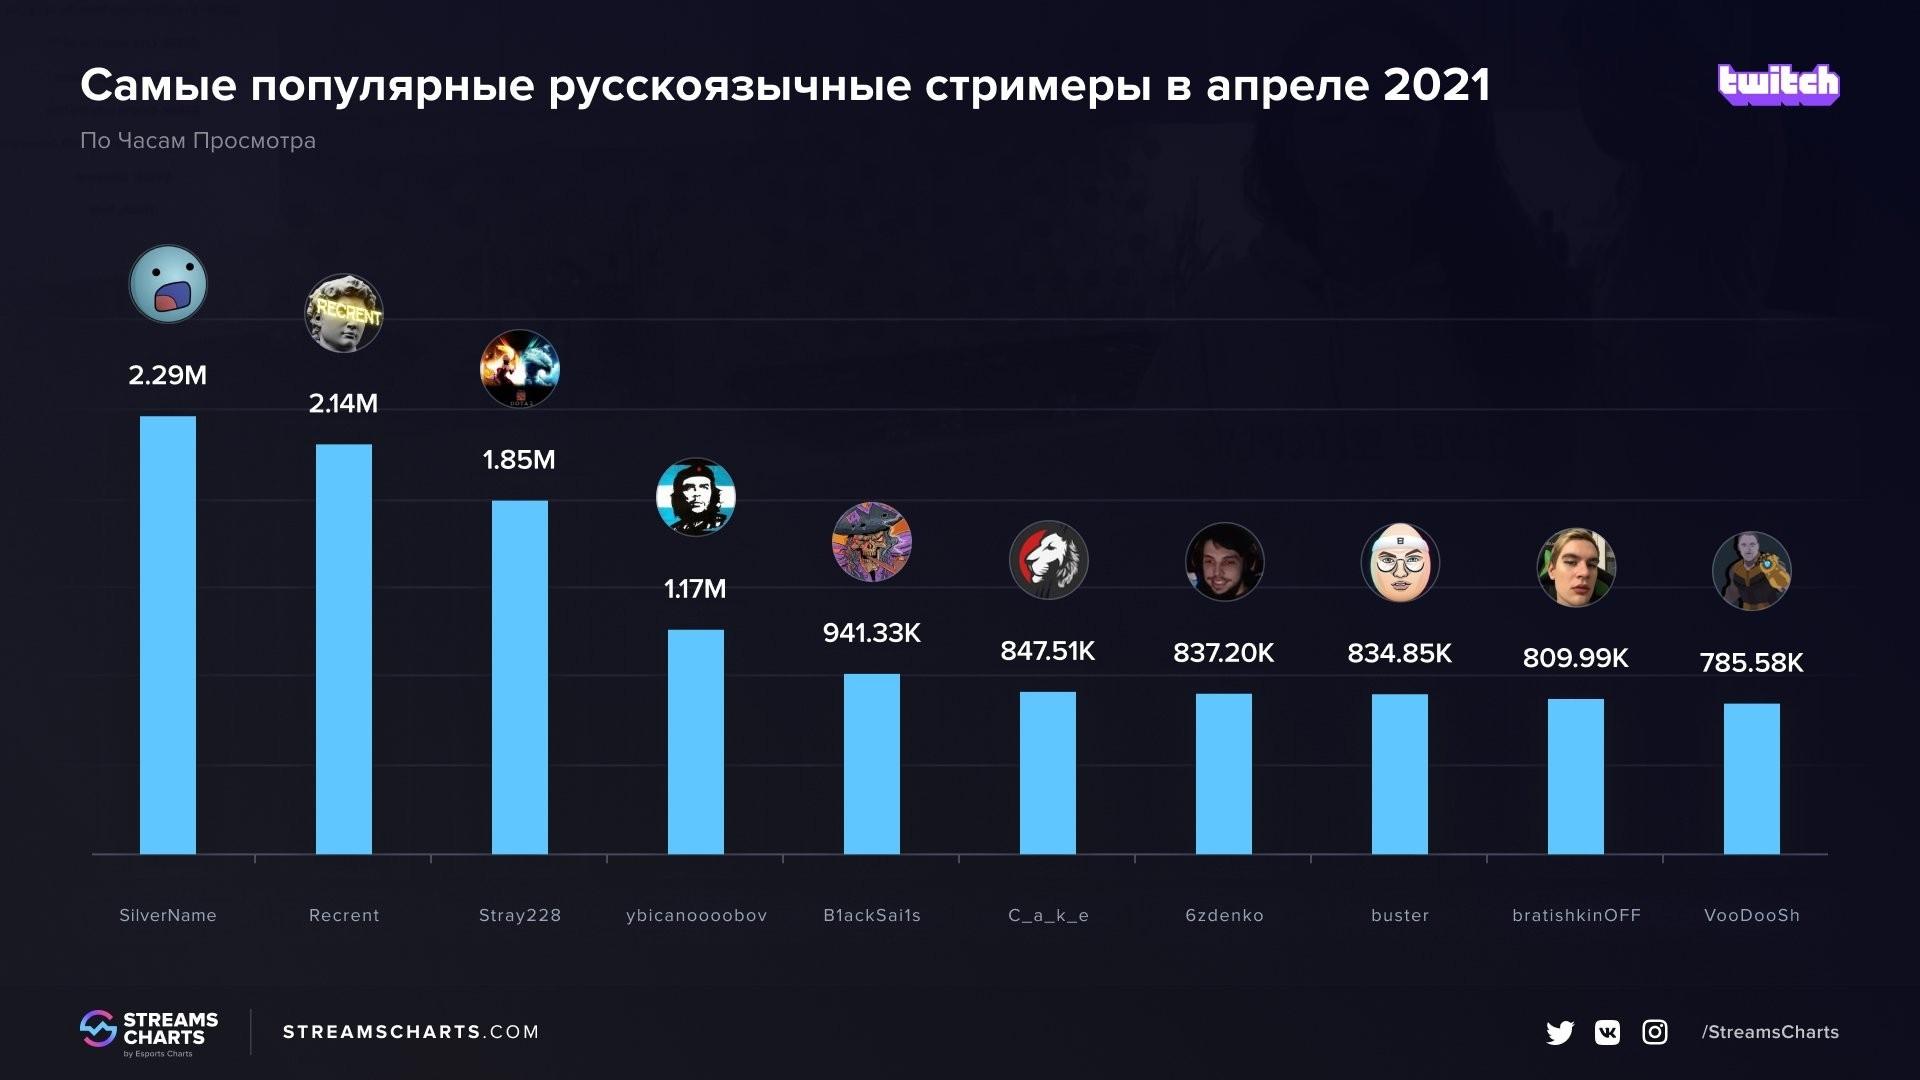 Silvername стал самым популярным русскоязычным стримером апреля